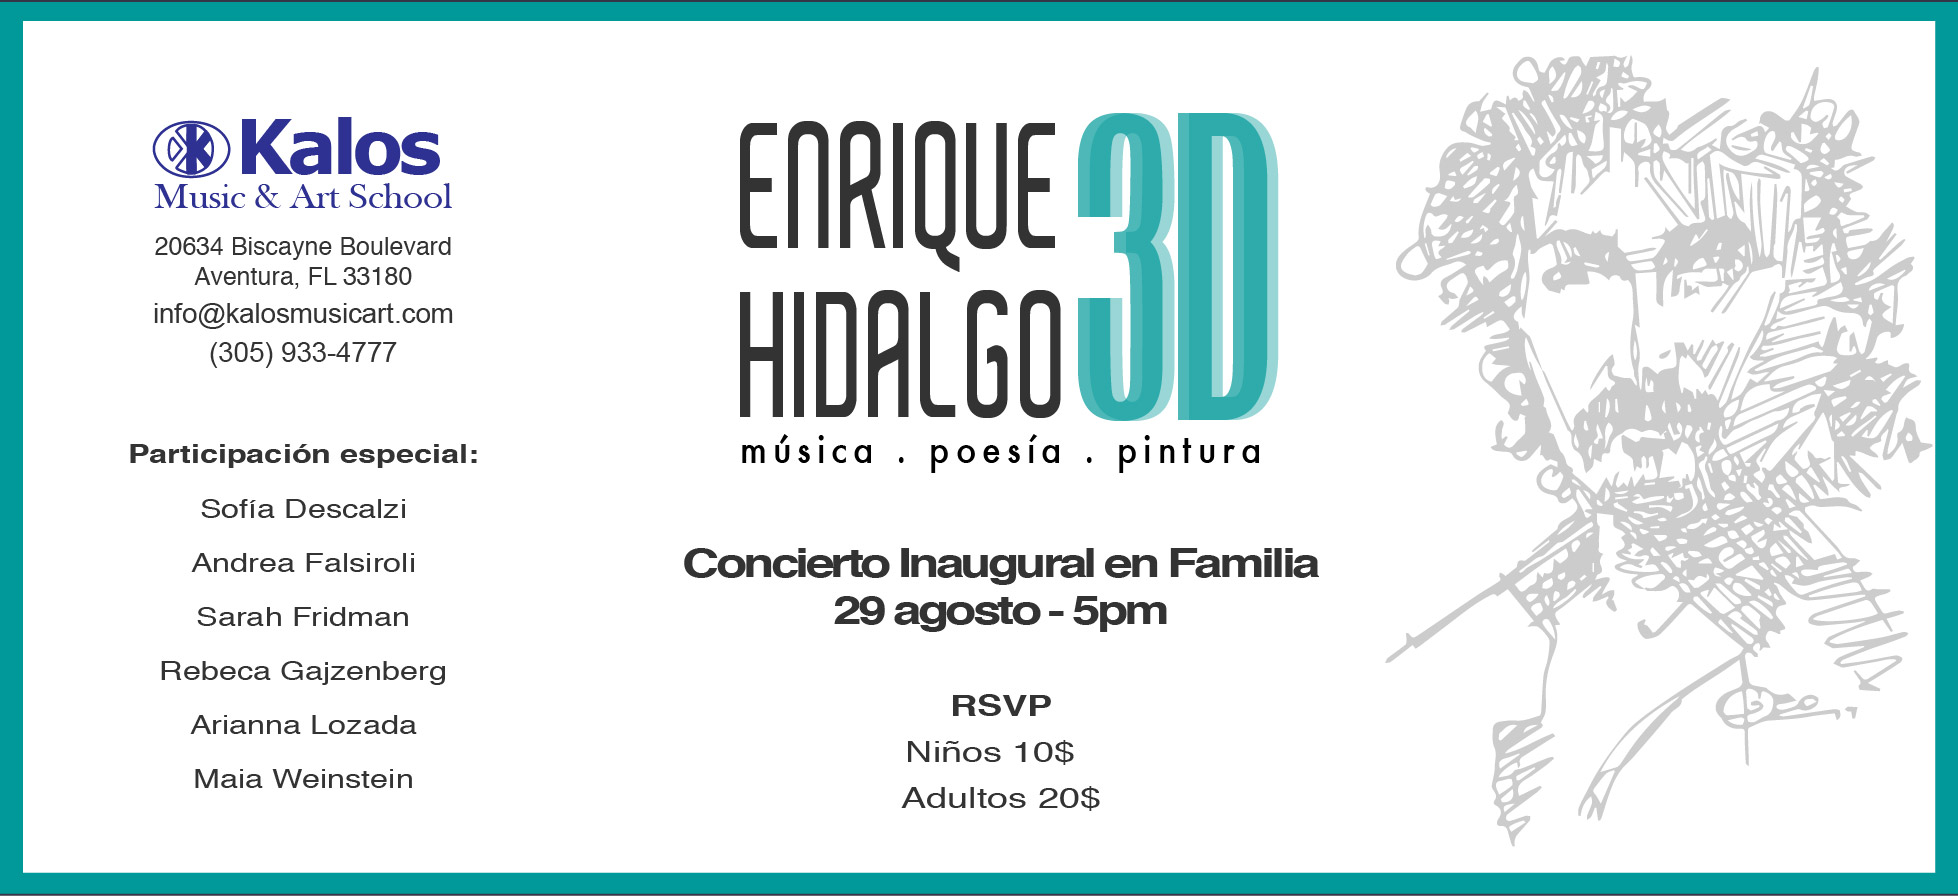 enrique hidalgo_web carrousel